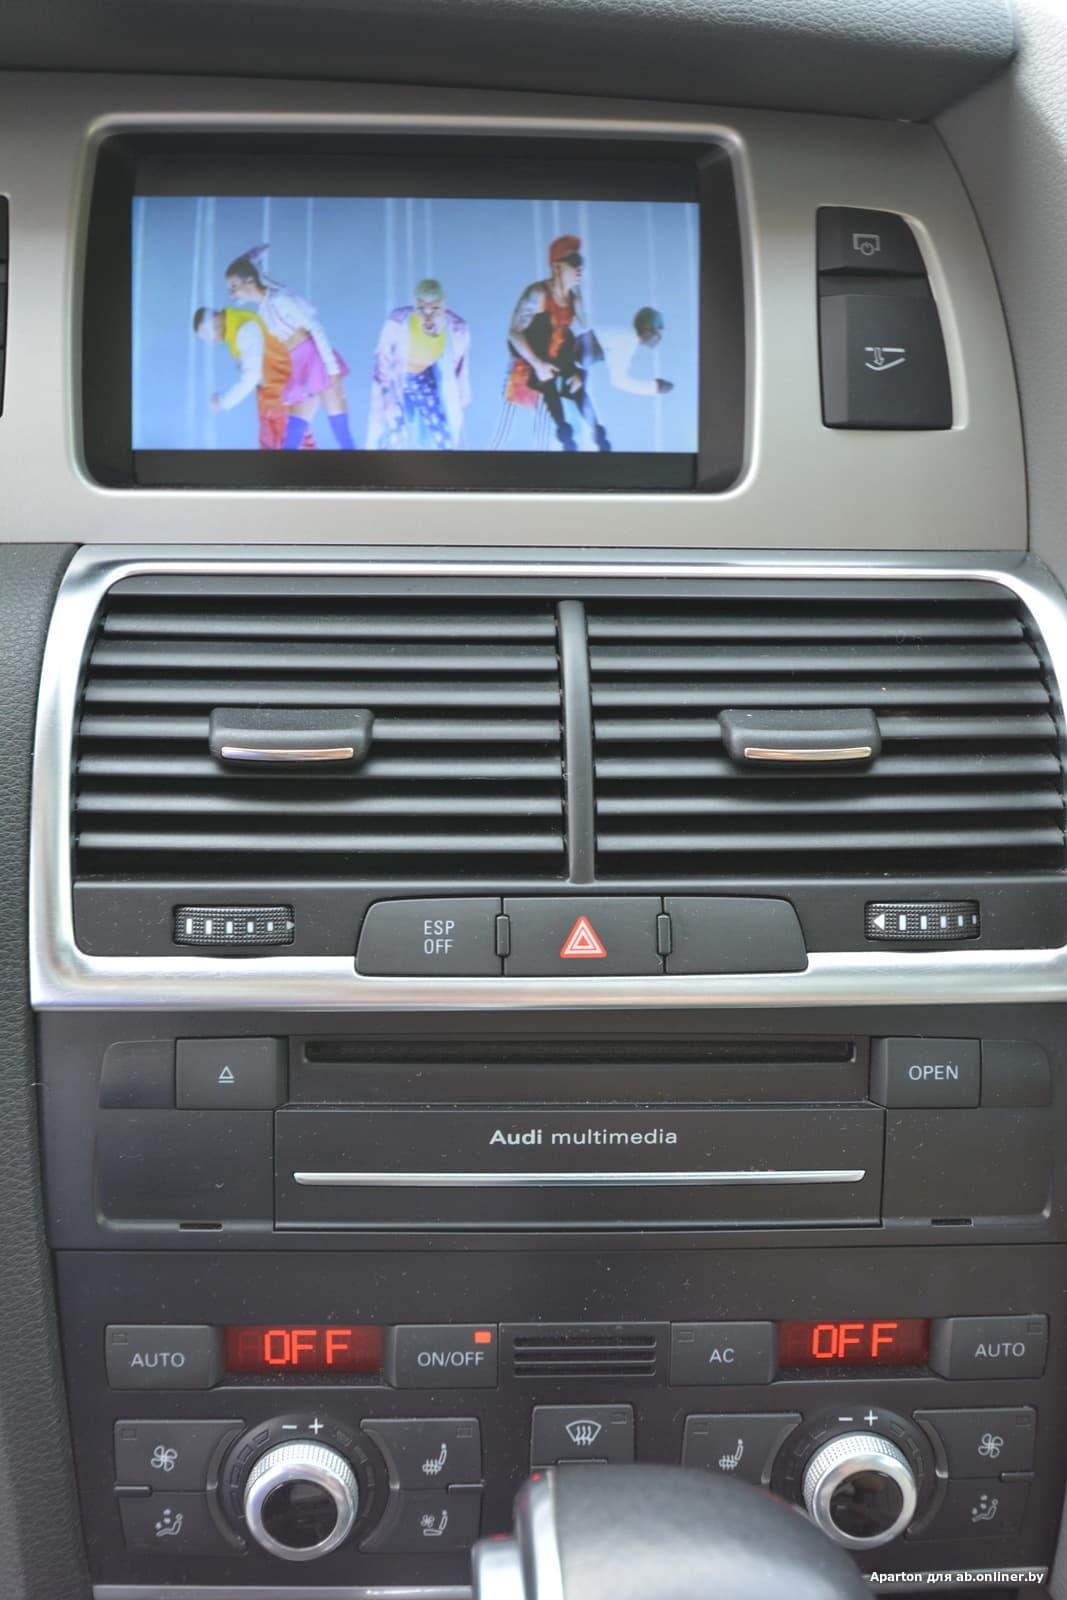 Audi Q7 S-Line Max Edition 7 seats